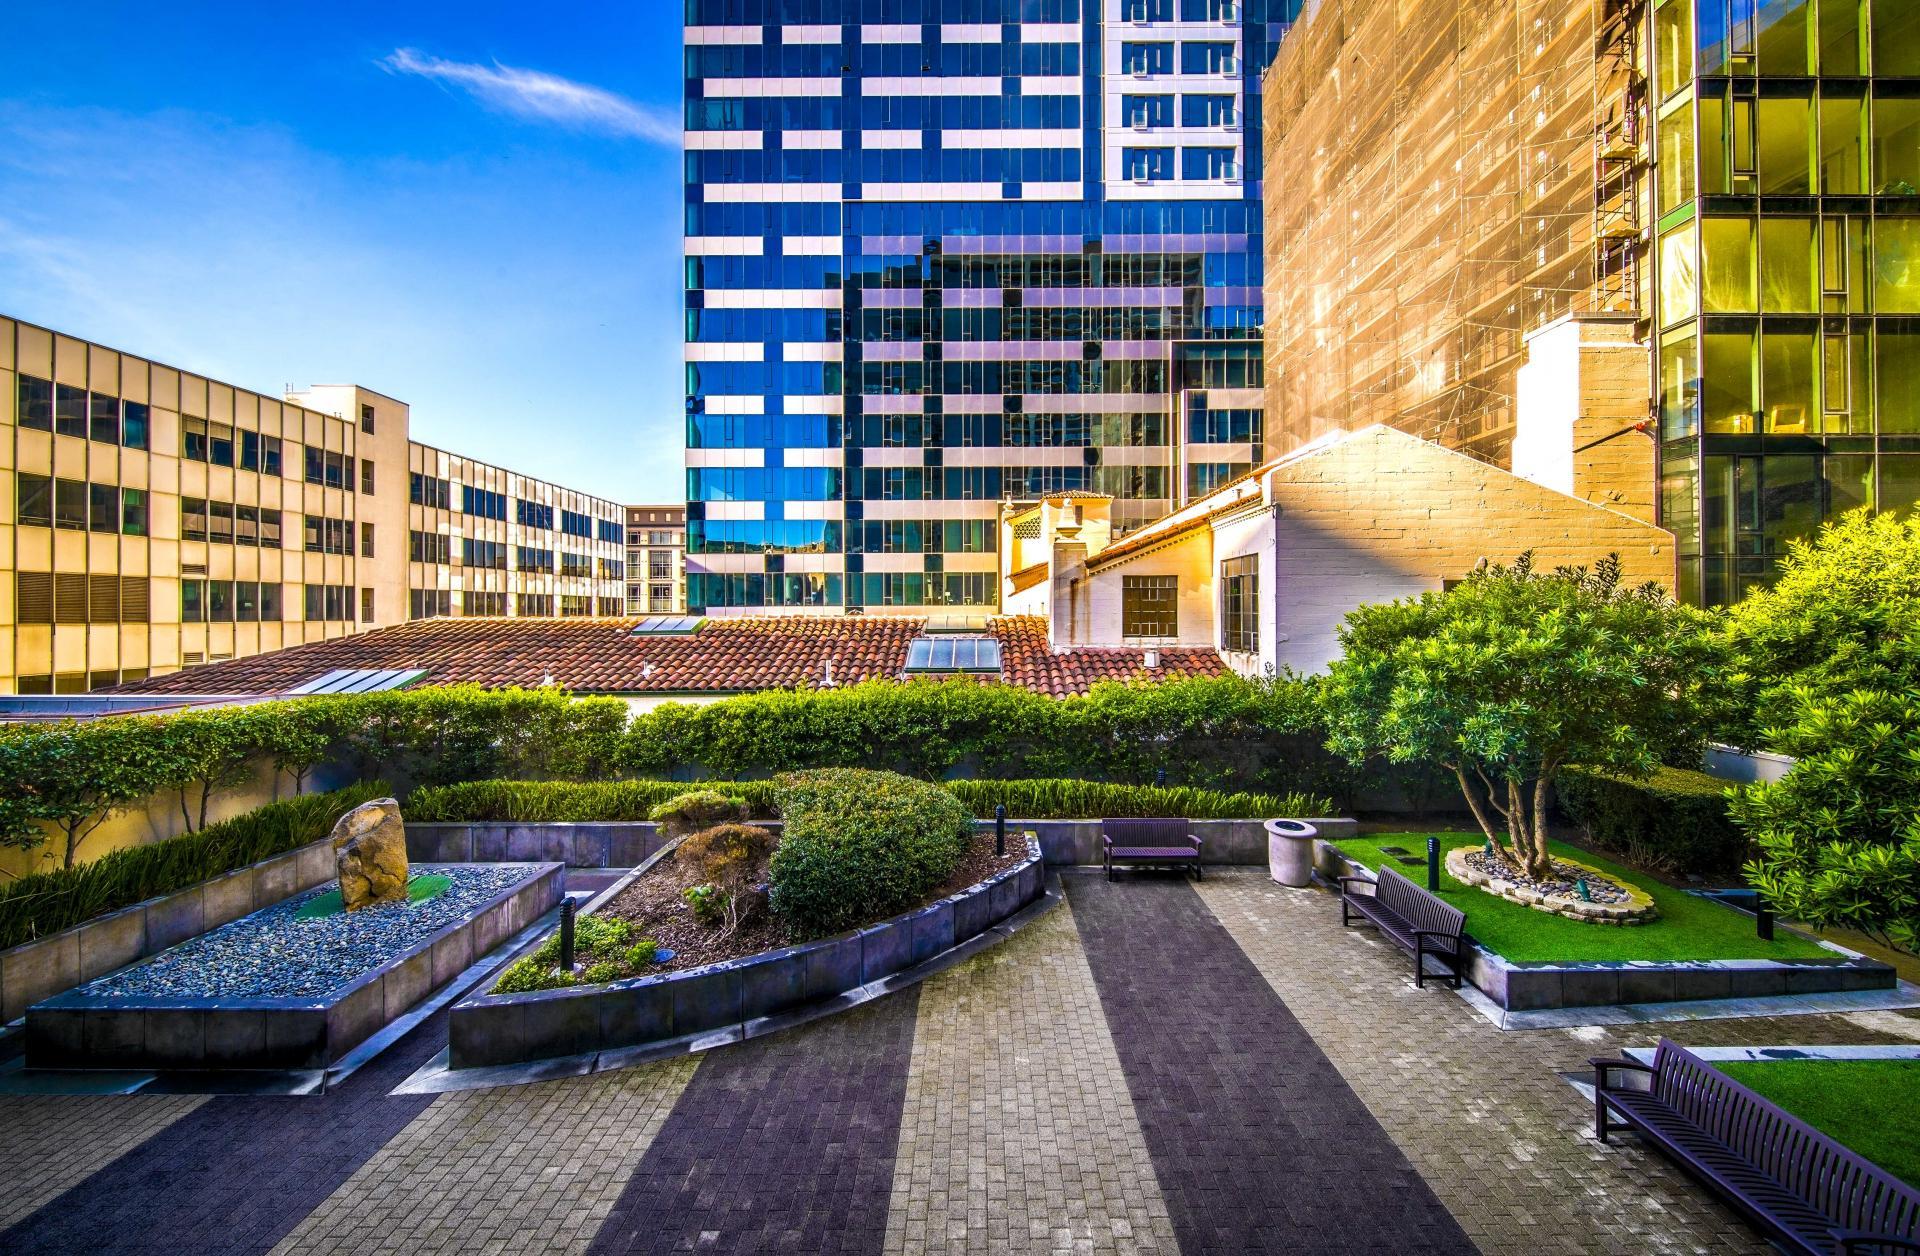 Garden at Argenta Apartment, Hayes Valley, San Francisco